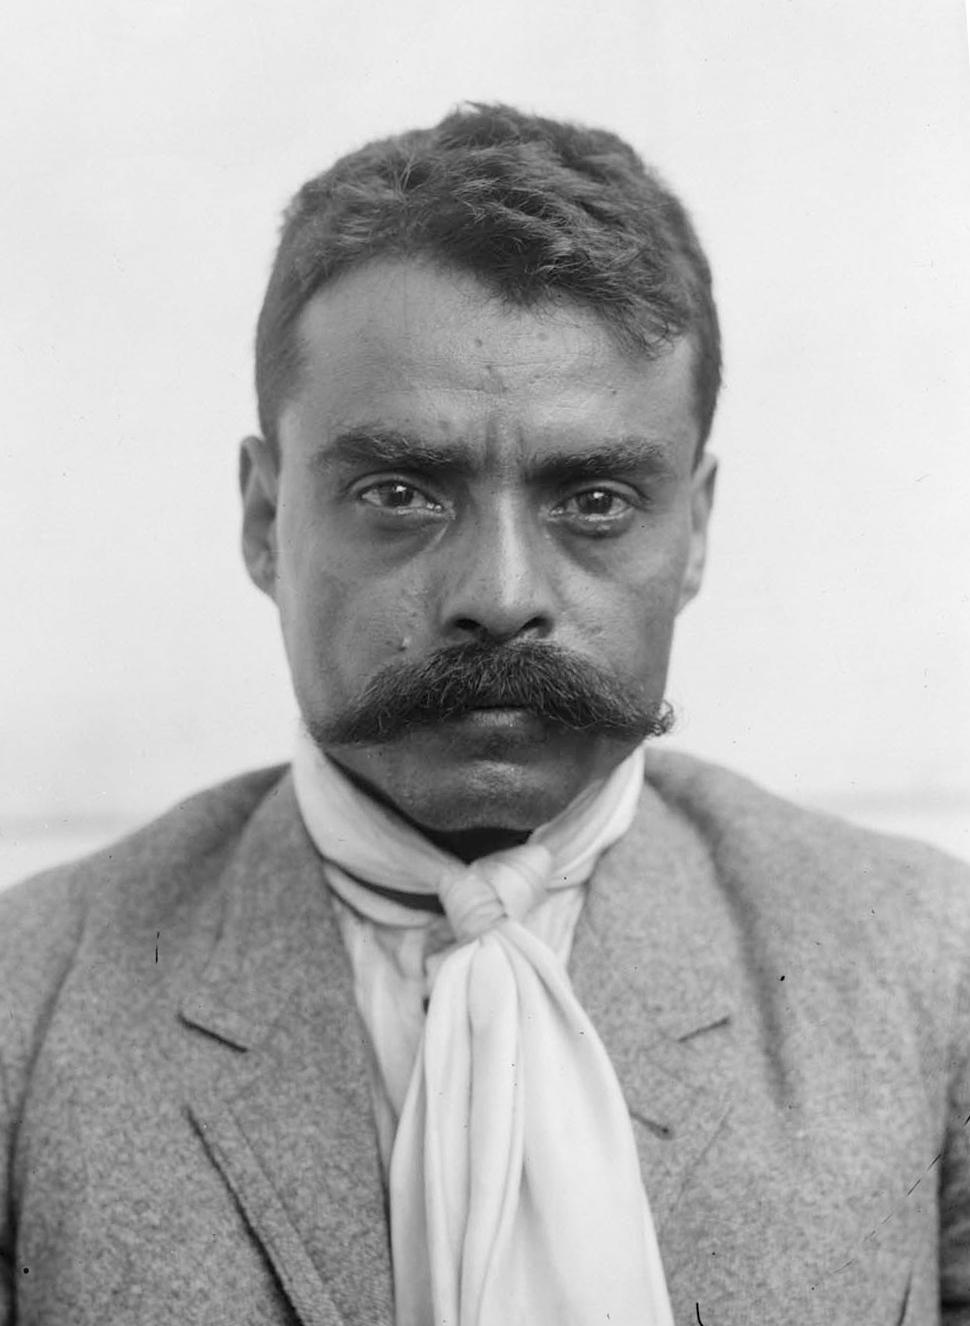 http://upload.wikimedia.org/wikipedia/commons/9/99/Emiliano_Zapata4.jpg